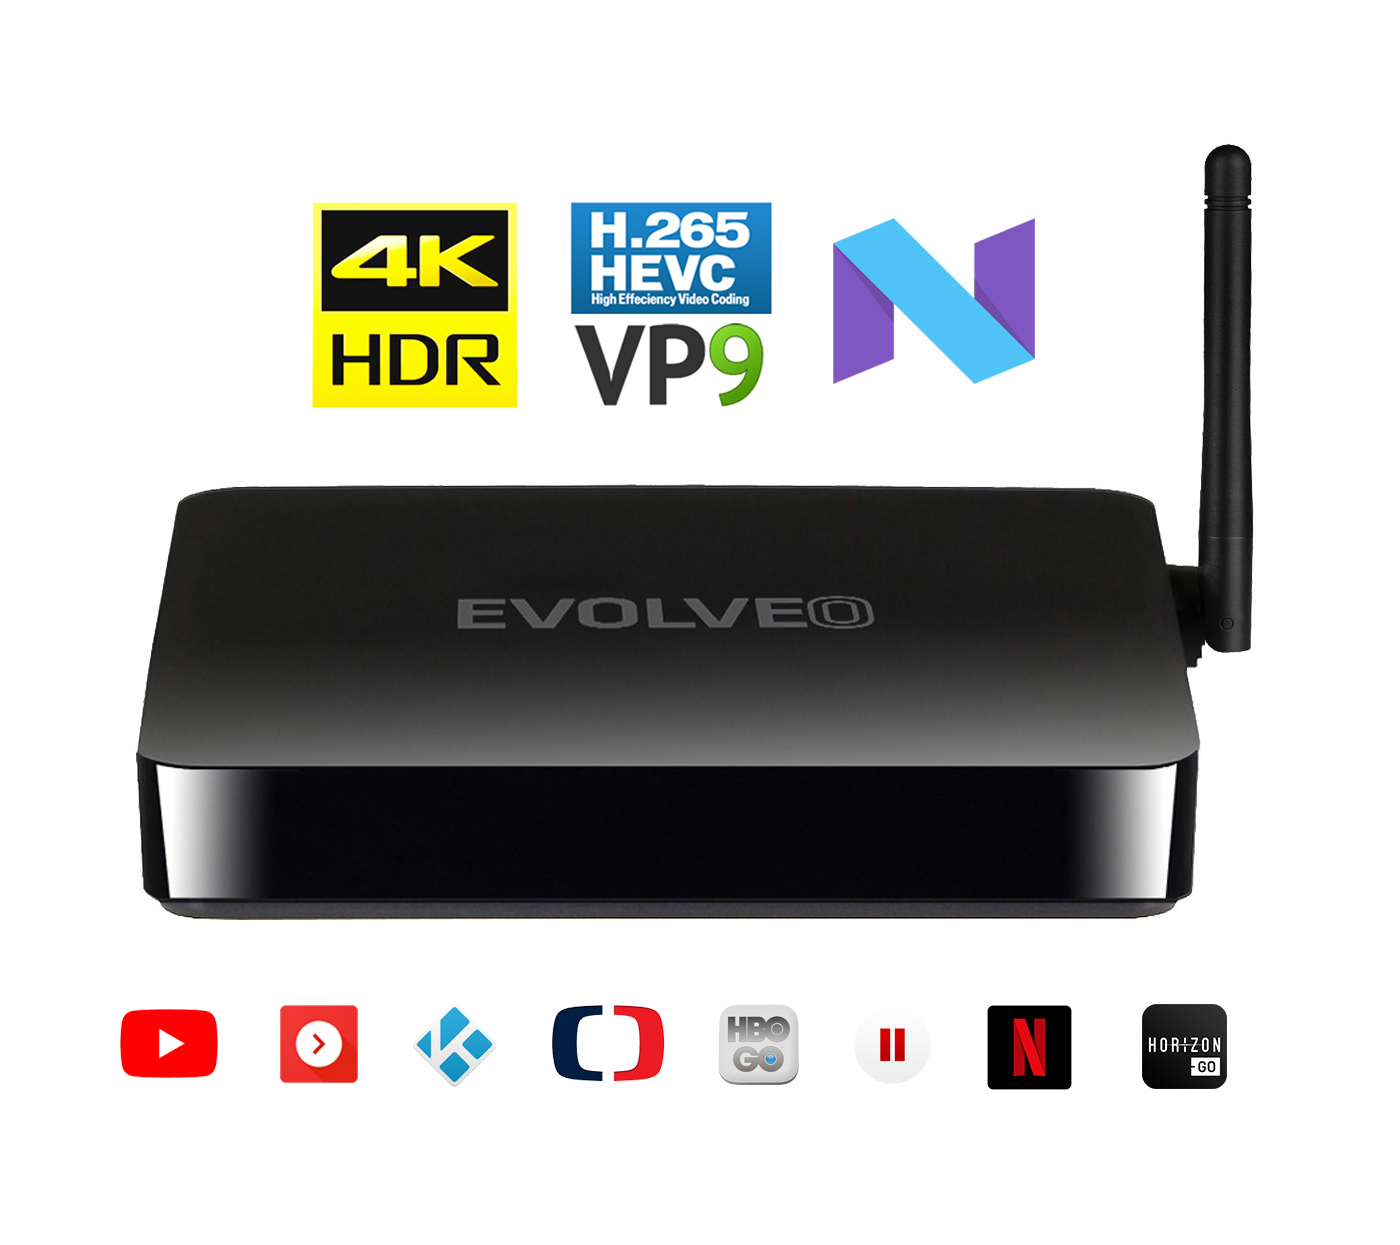 d9e5638c4a EVOLVEO MultiMedia Box M4, Quad Core multimedia center EVOLVEO.COM/EN